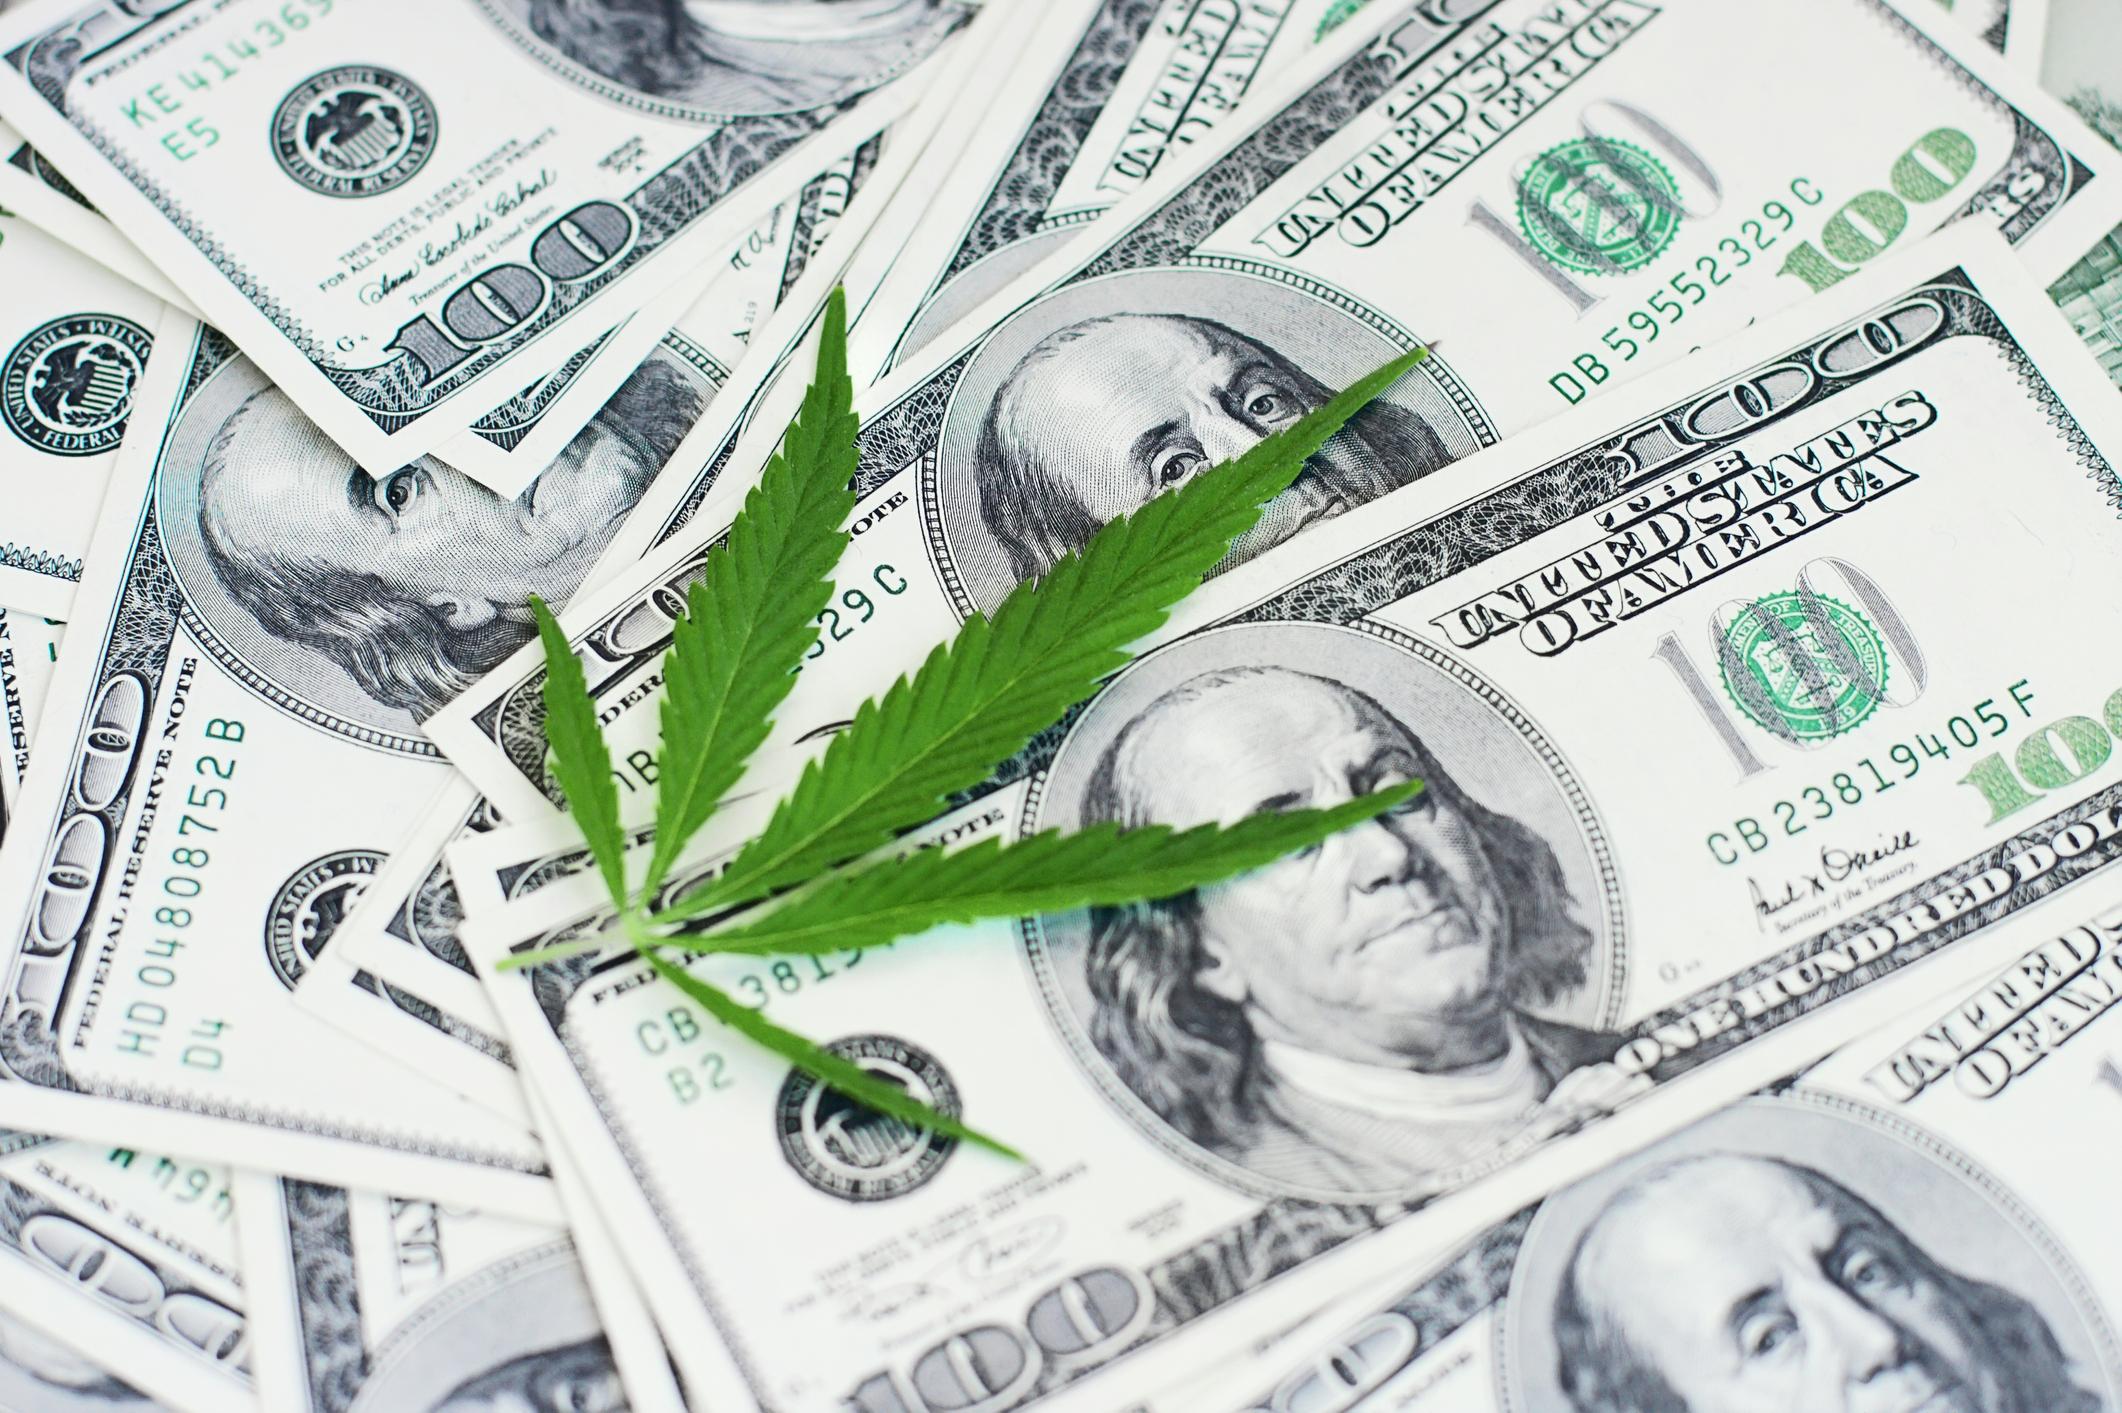 3 Marijuana Stocks That Could Be Millionaire-Makers